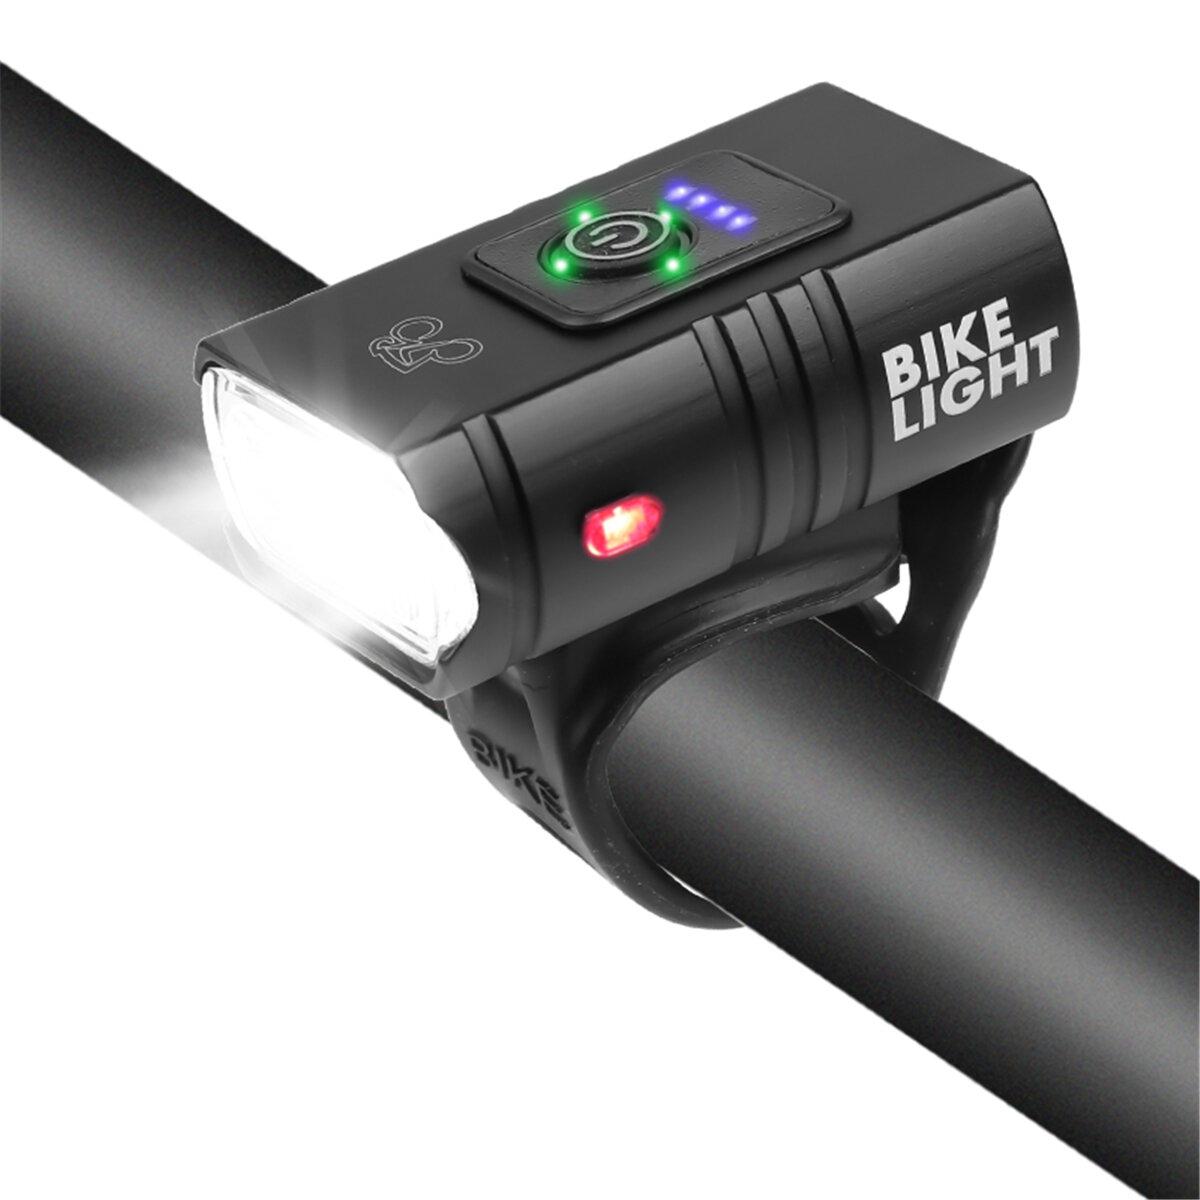 2xT6 LED 800Lm Faro de bicicleta 1000mAh Super brillante 6 modos Ajustable USB Recargable Delantero de bicicleta Lámpara